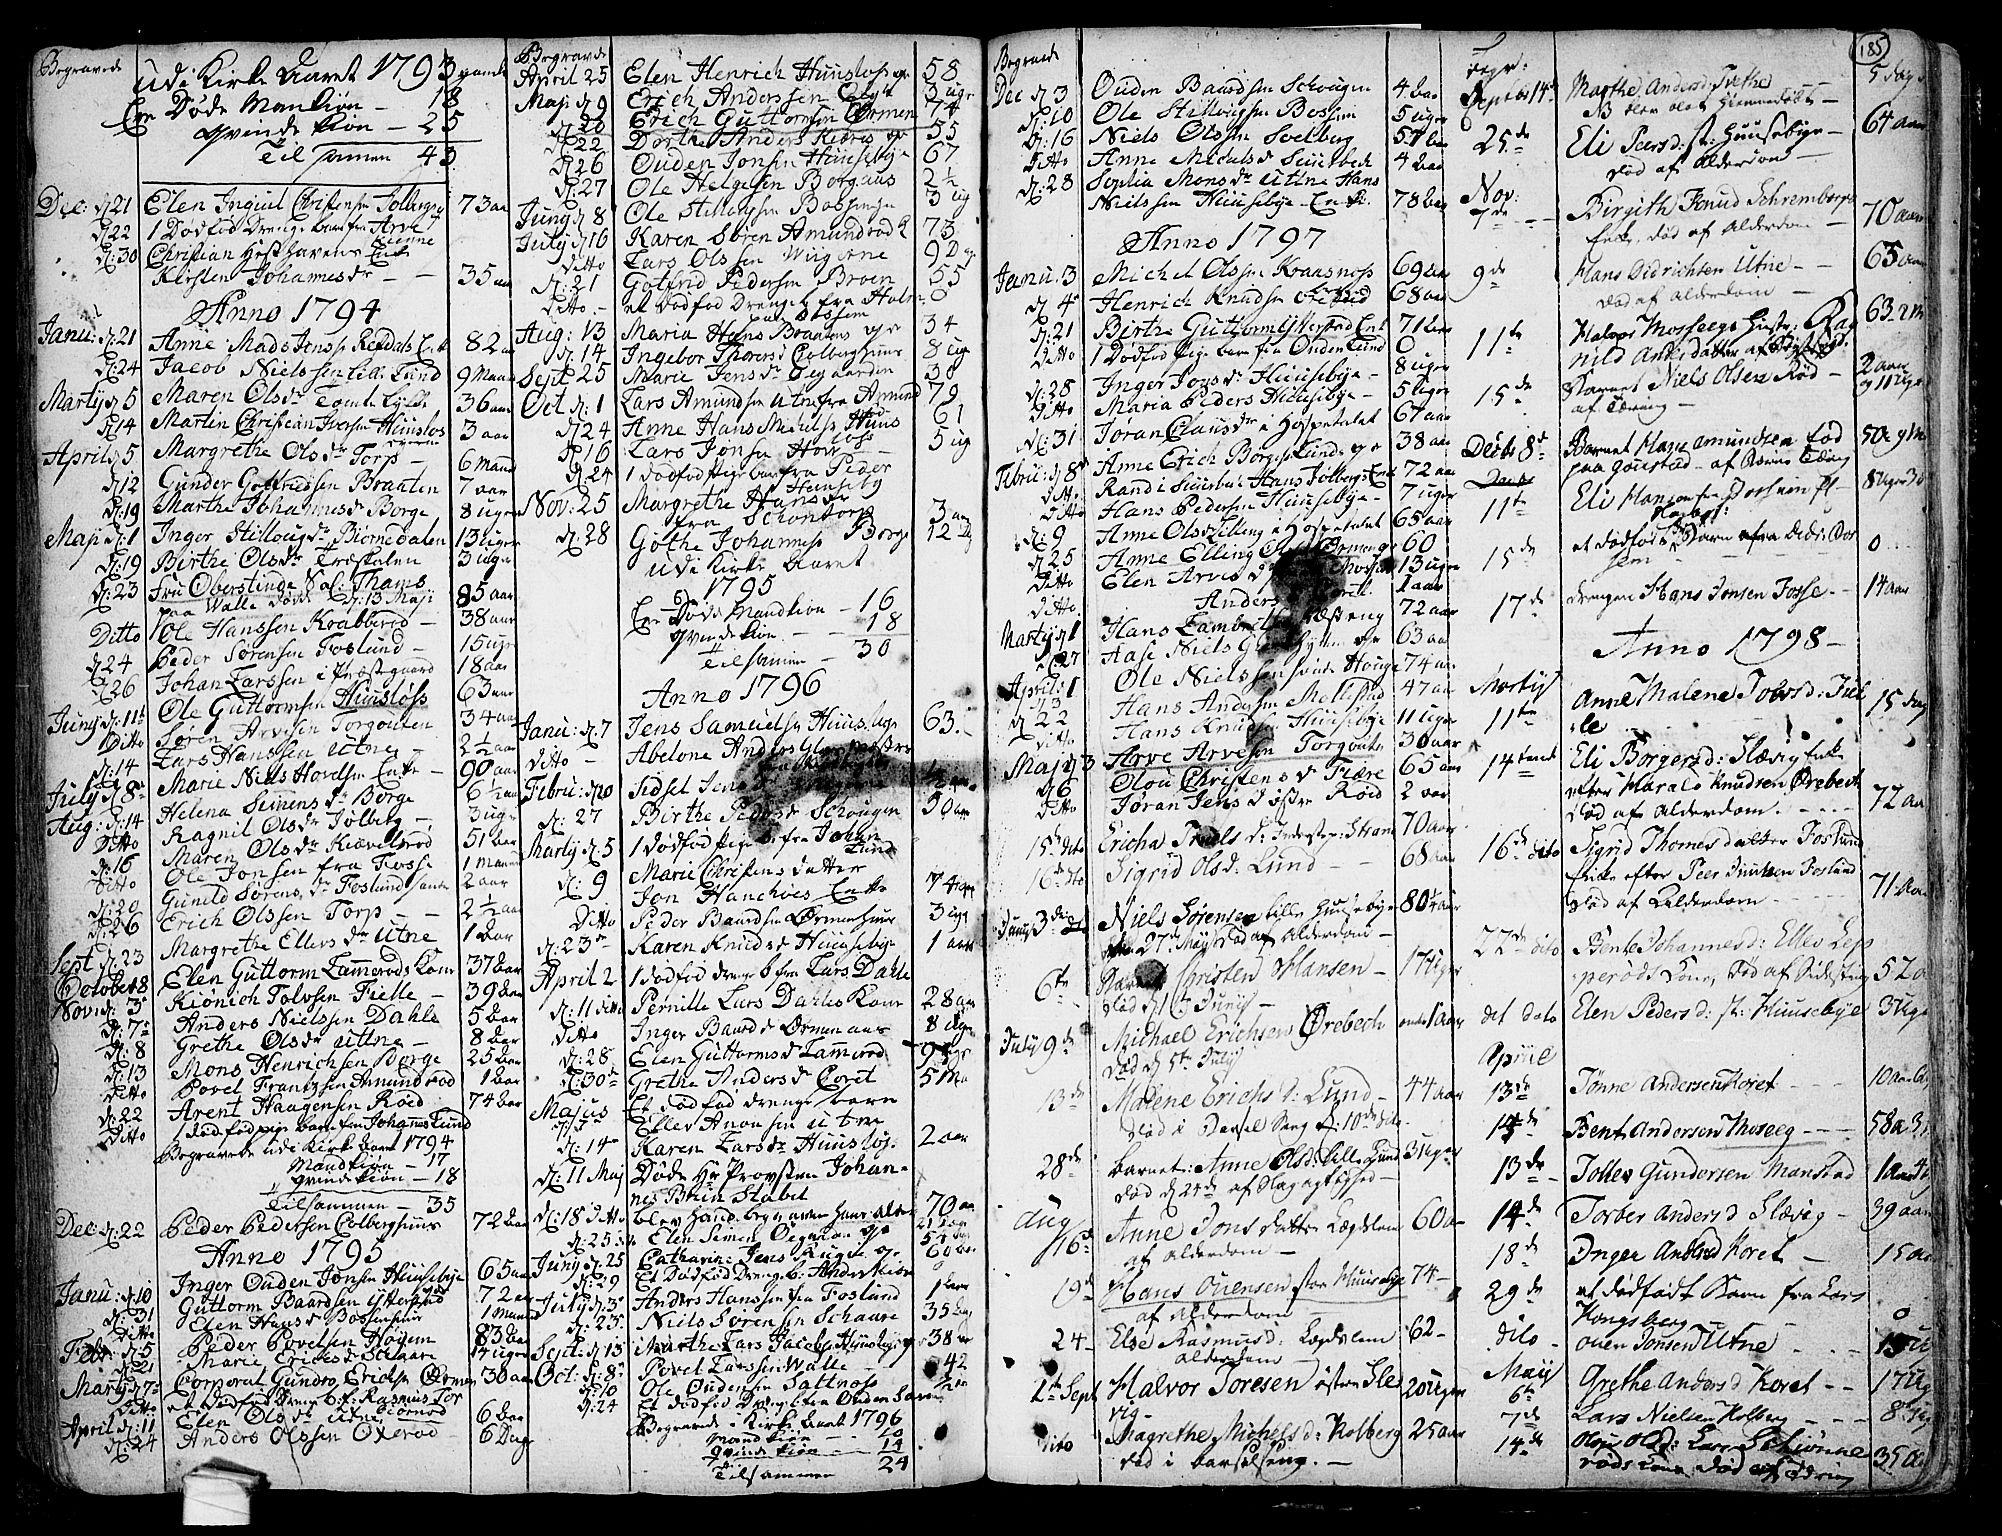 SAO, Onsøy prestekontor Kirkebøker, F/Fa/L0001: Ministerialbok nr. I 1, 1733-1814, s. 185